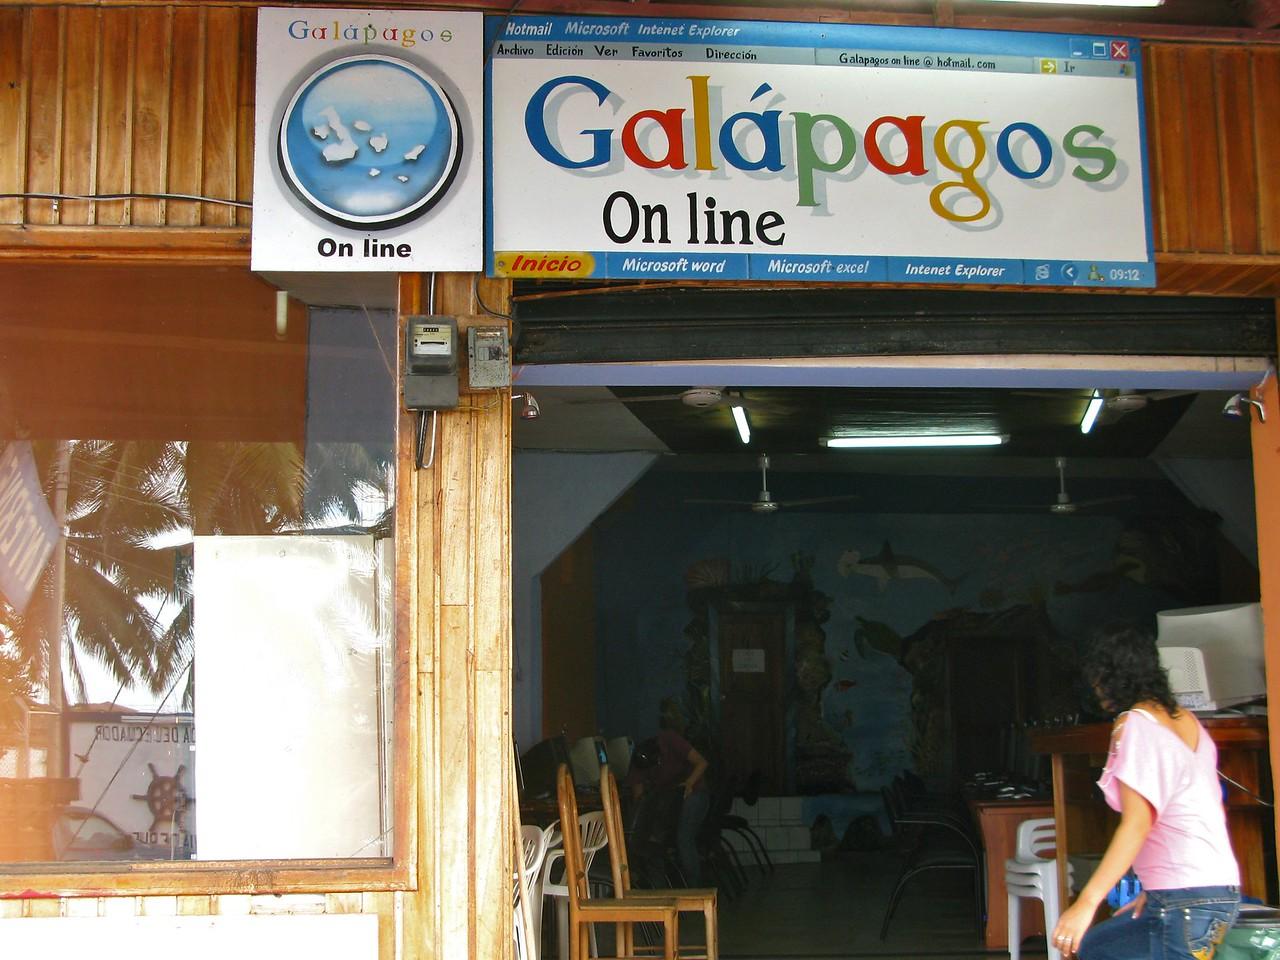 Internet cafe with familiar logo/color scheme